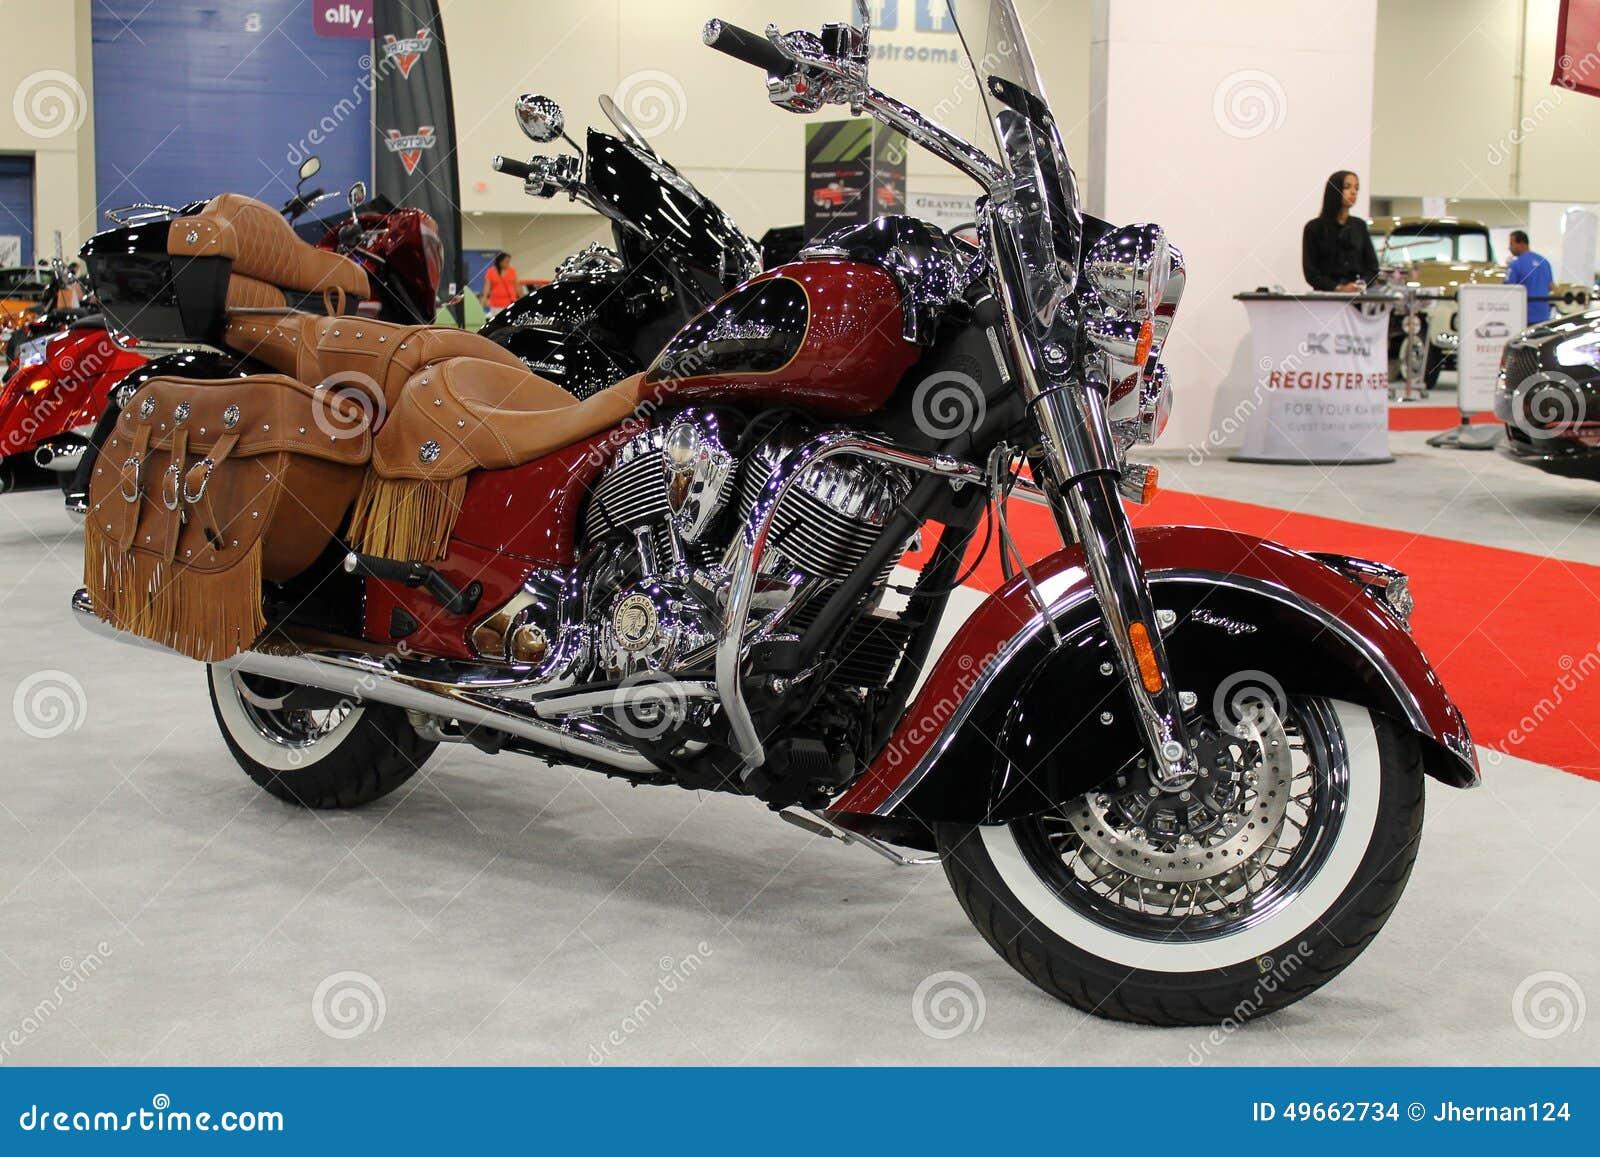 Ducati Dealer South Florida